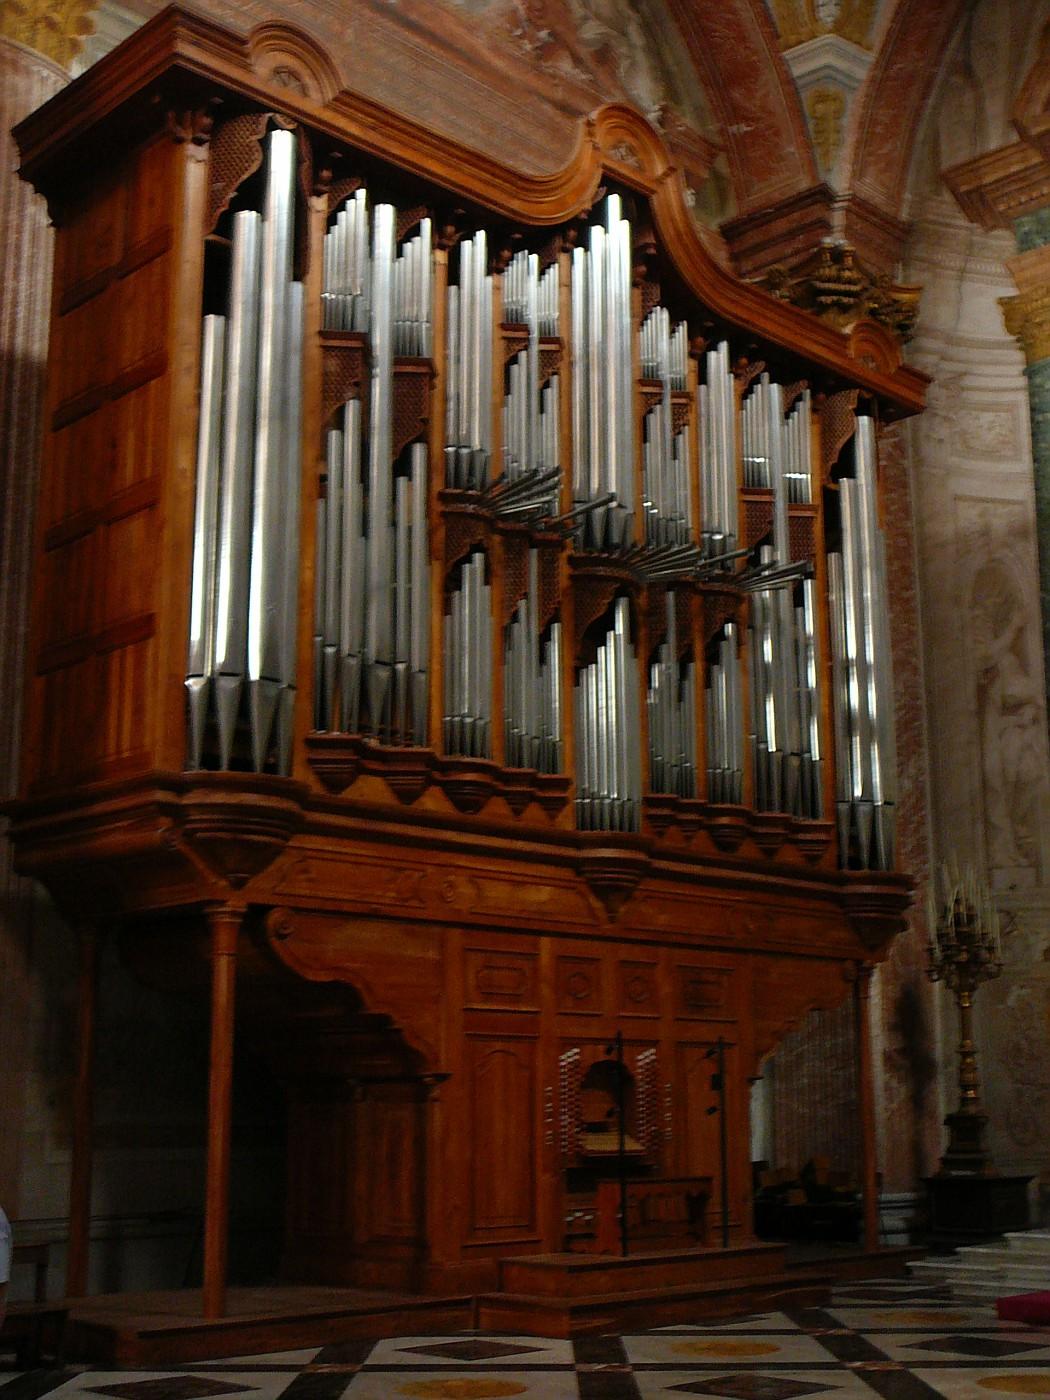 Huge Organ in Santa MariaDegli Angeli